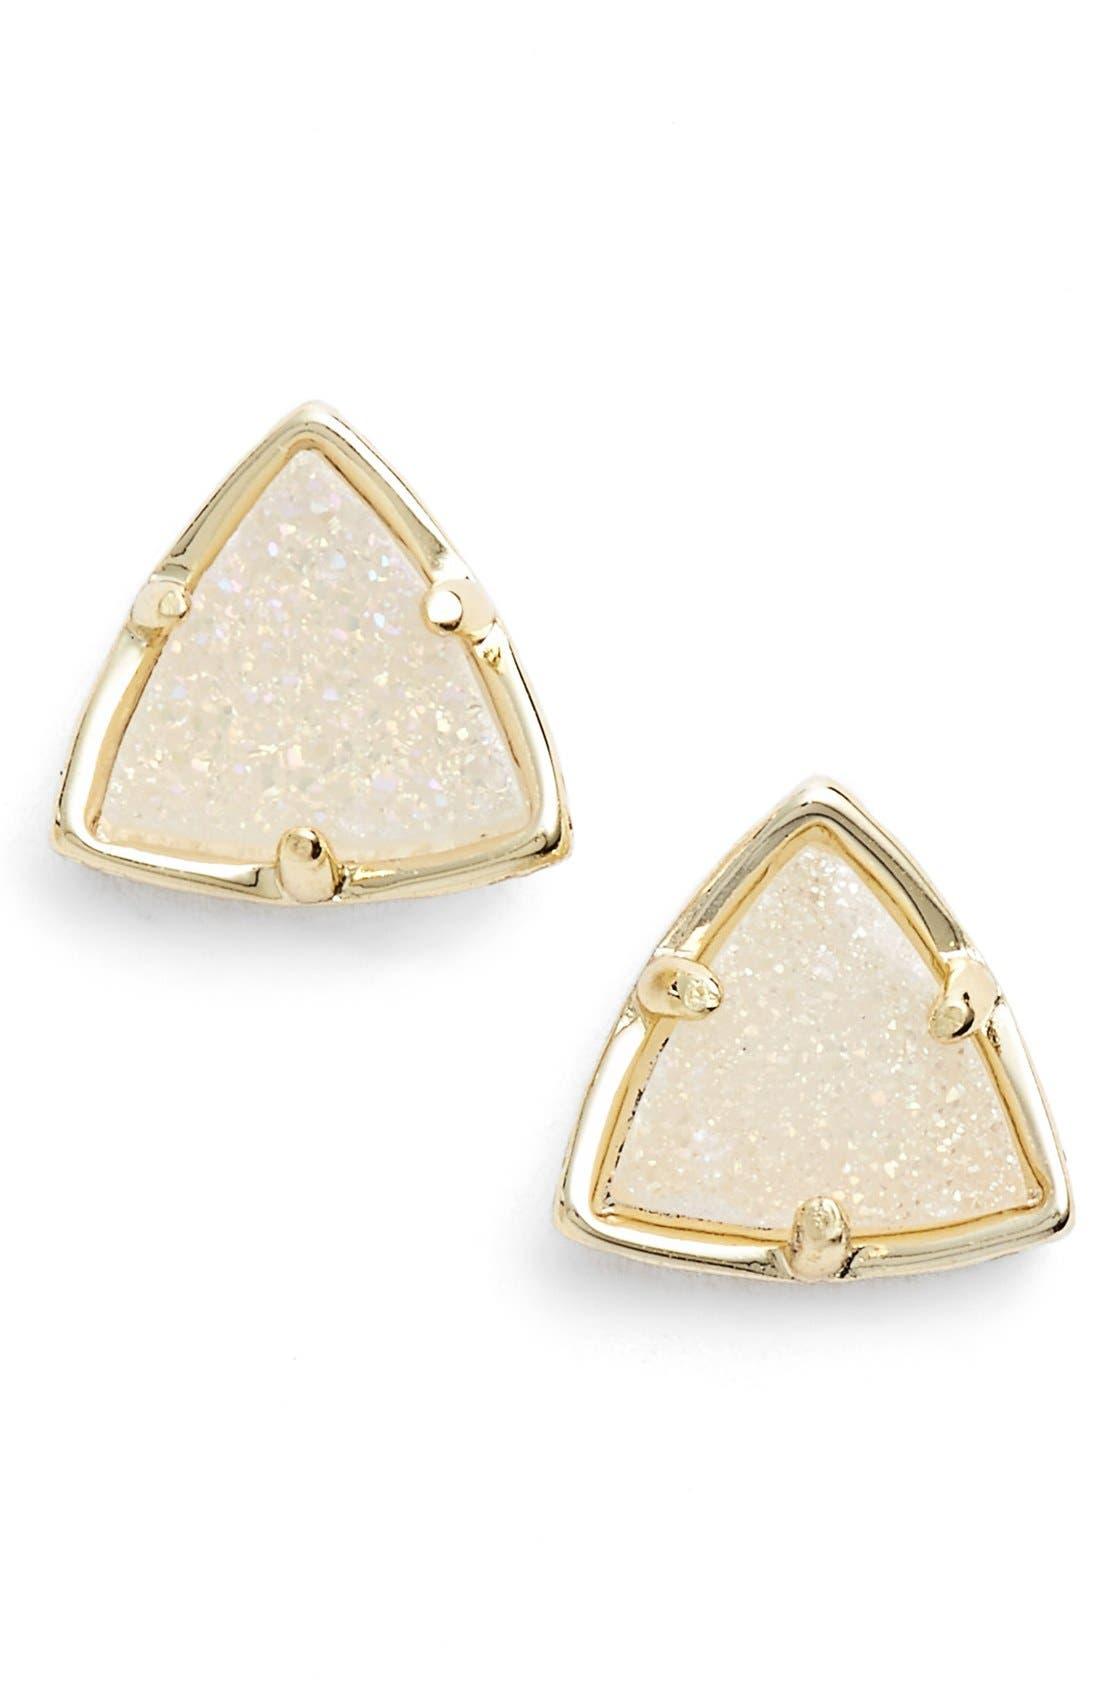 Alternate Image 1 Selected - Kendra Scott 'Parker' Stud Earrings